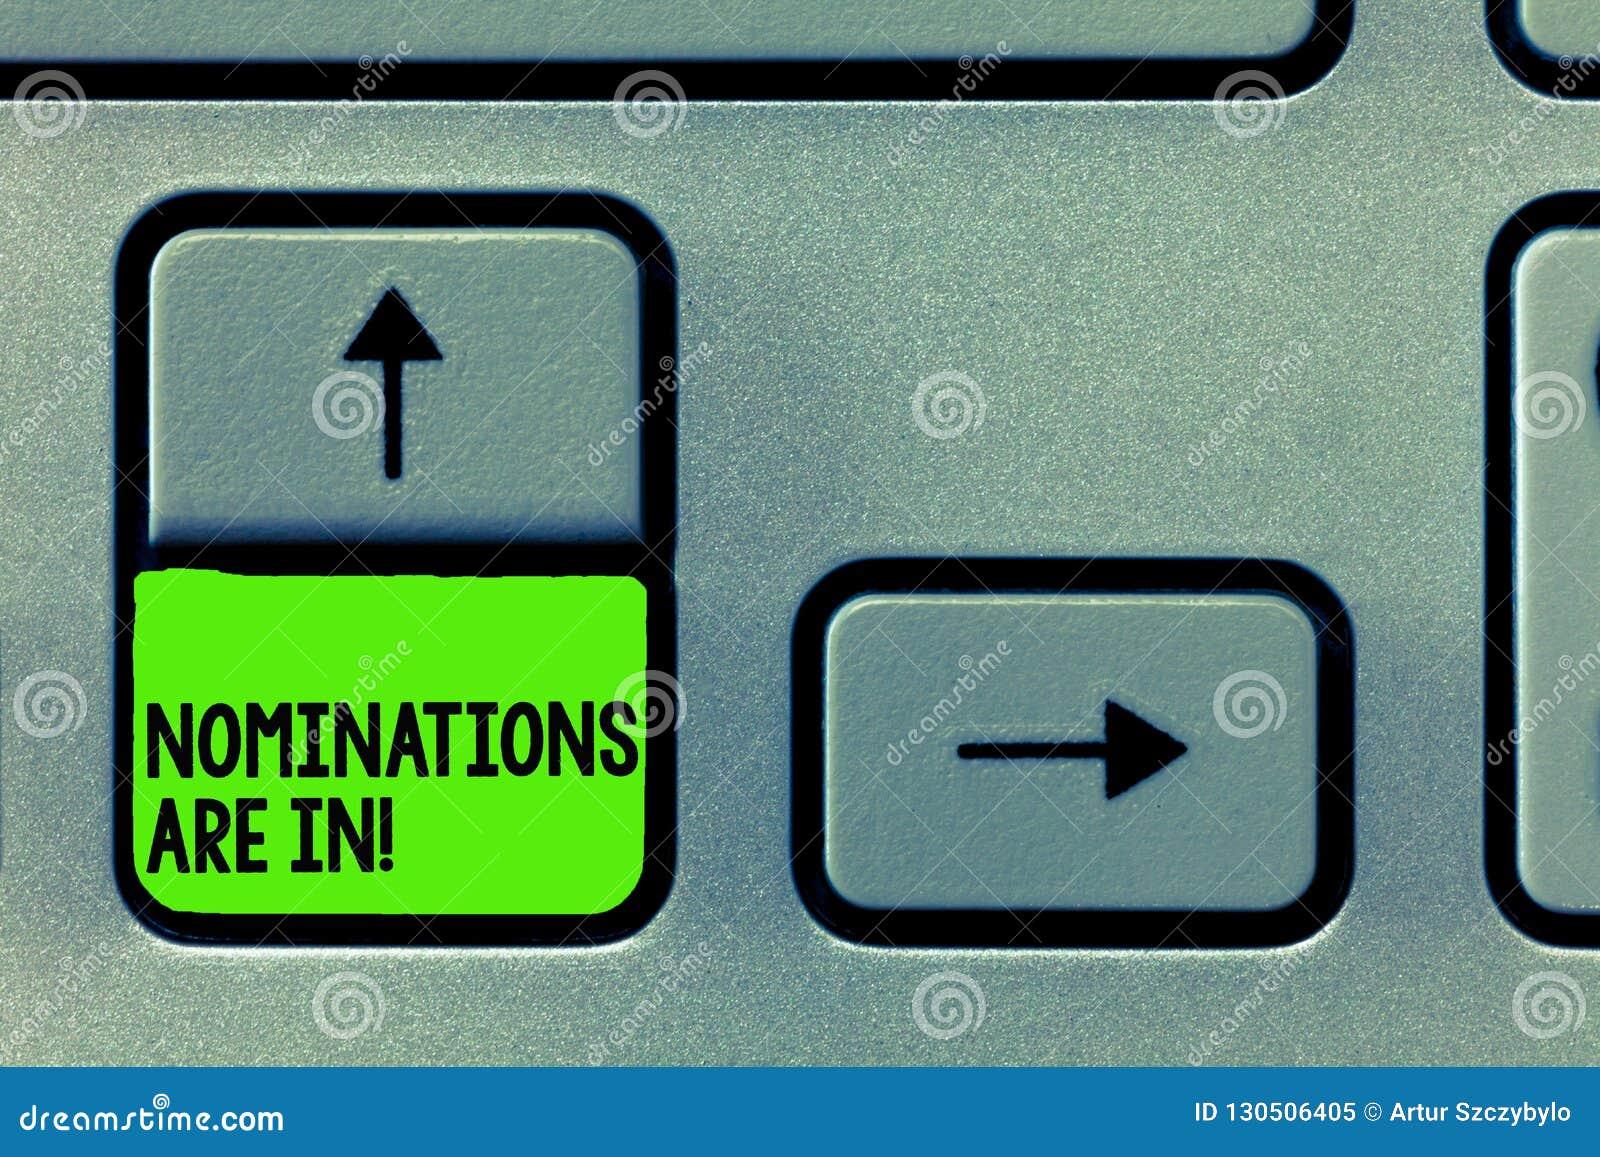 Writing company nominations